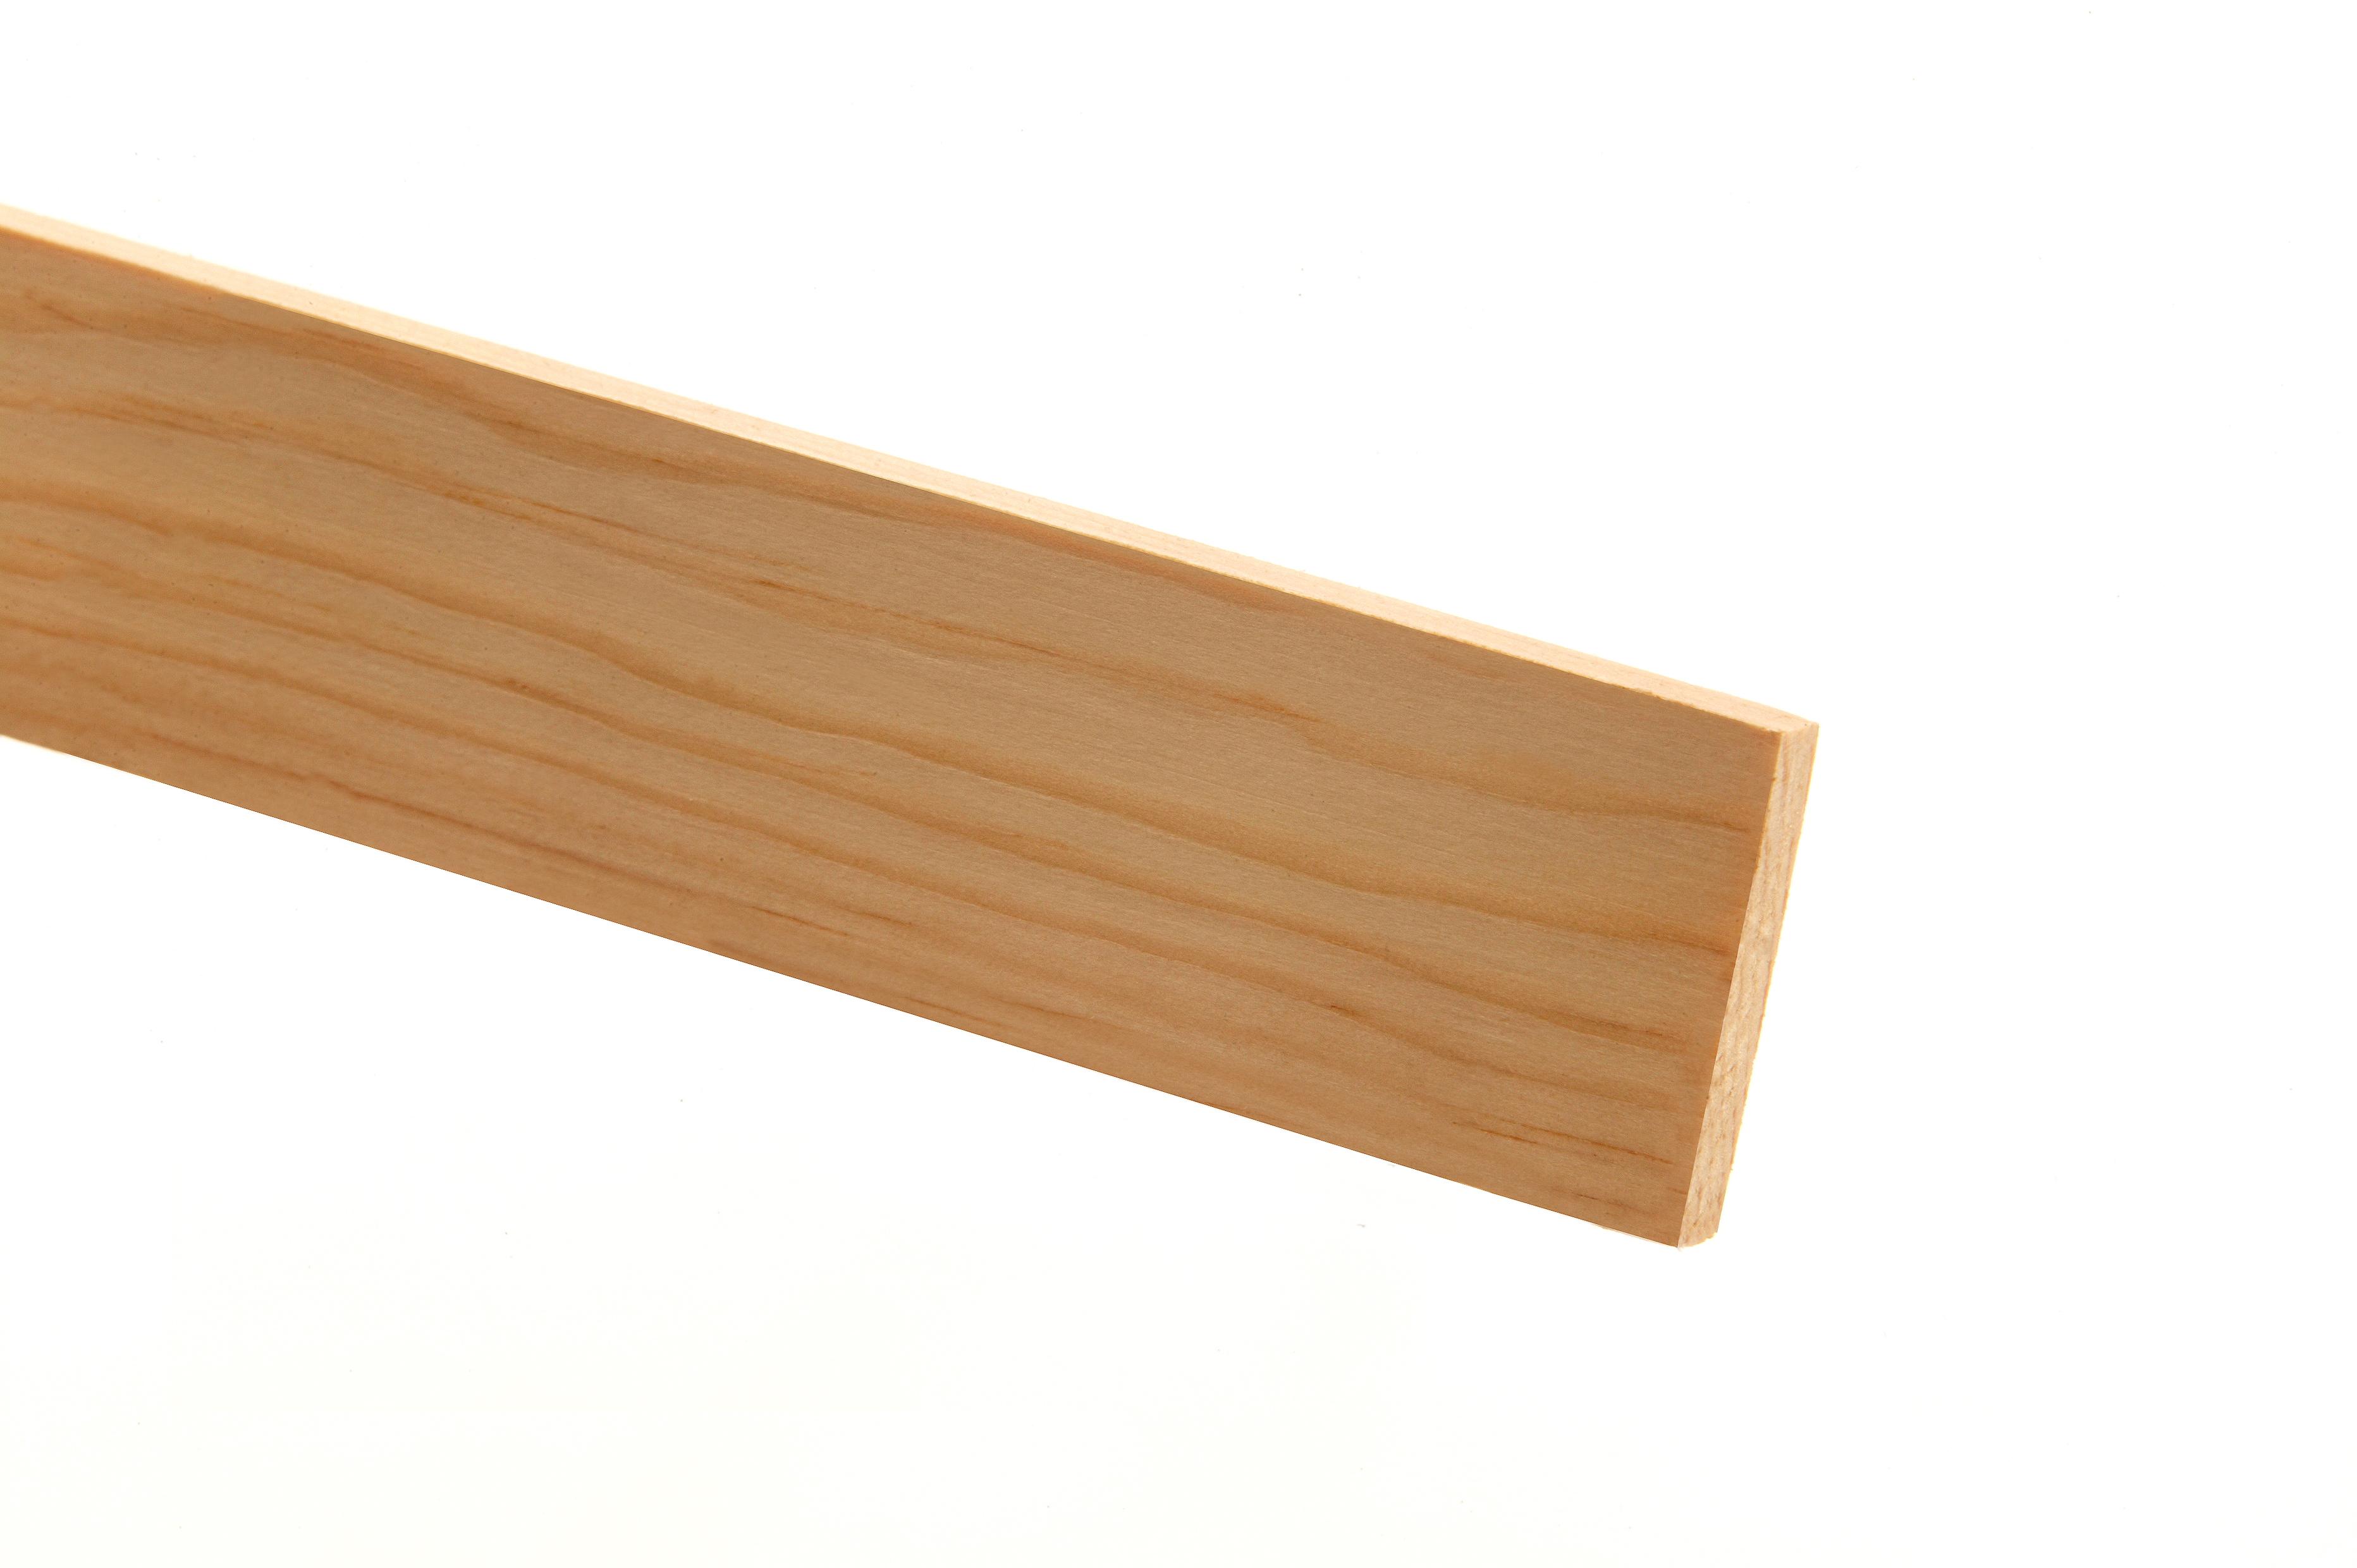 20 Pine PSE Stripwood 15 x 44.5 x 2400mm